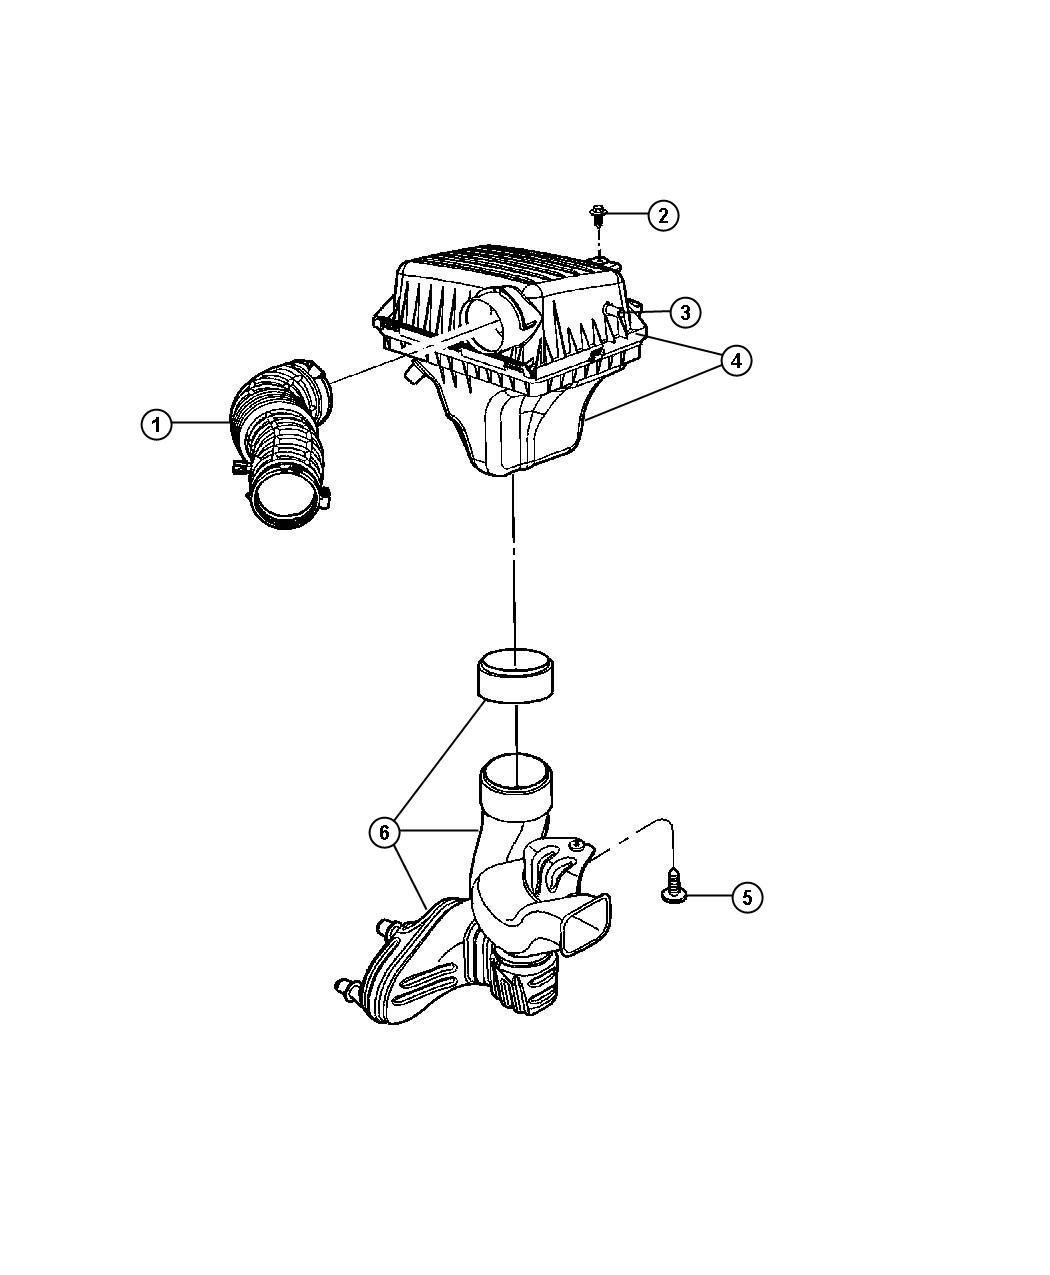 Dodge Charger Hose Make Up Air Cleaner Crankcase